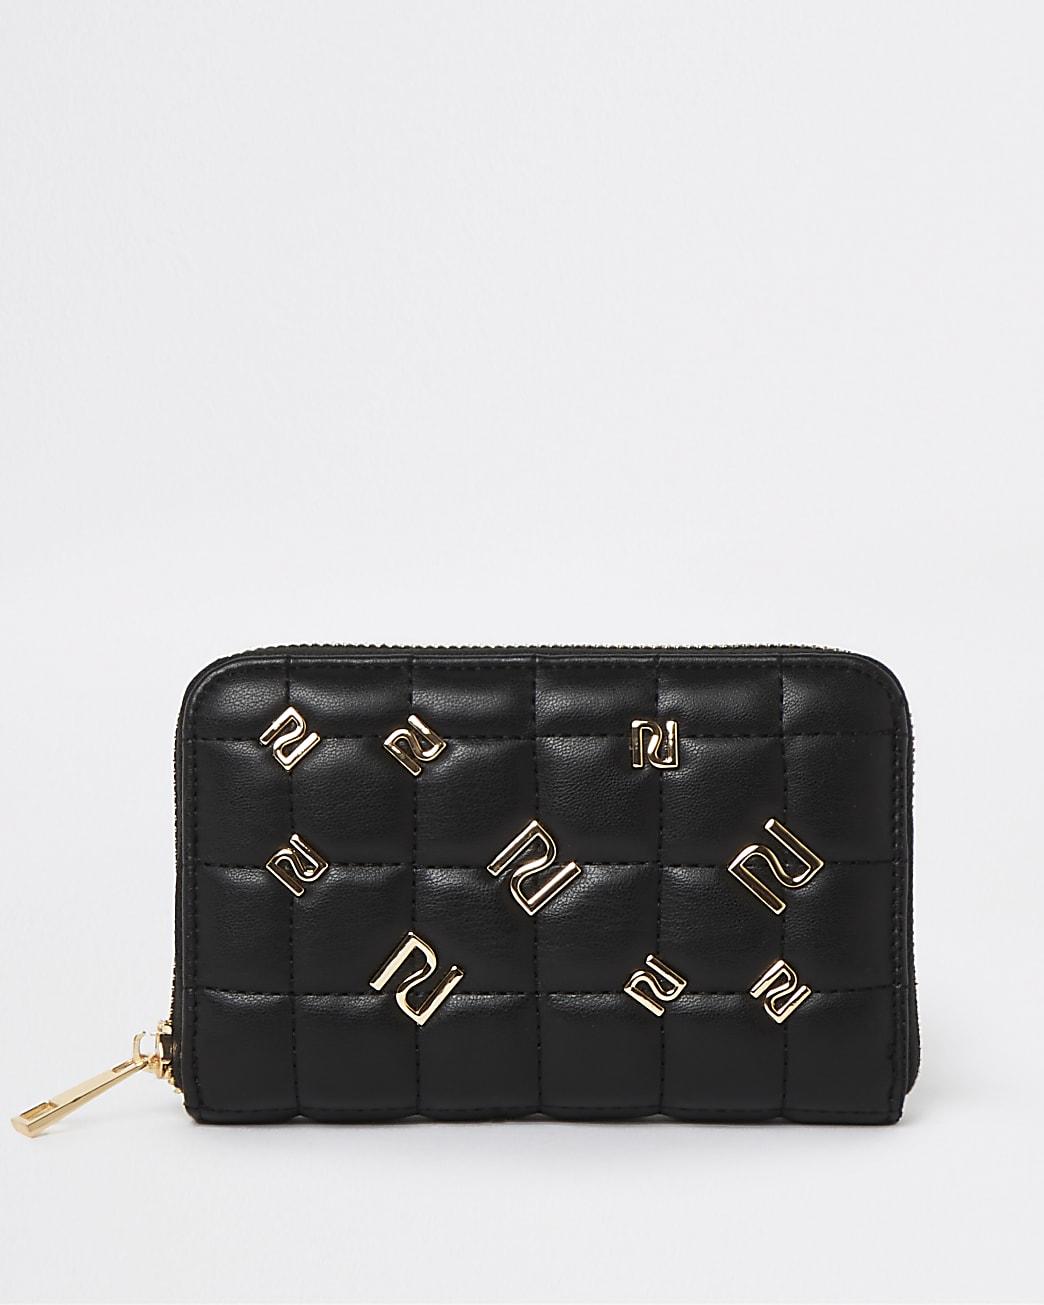 Black RI branded studded purse